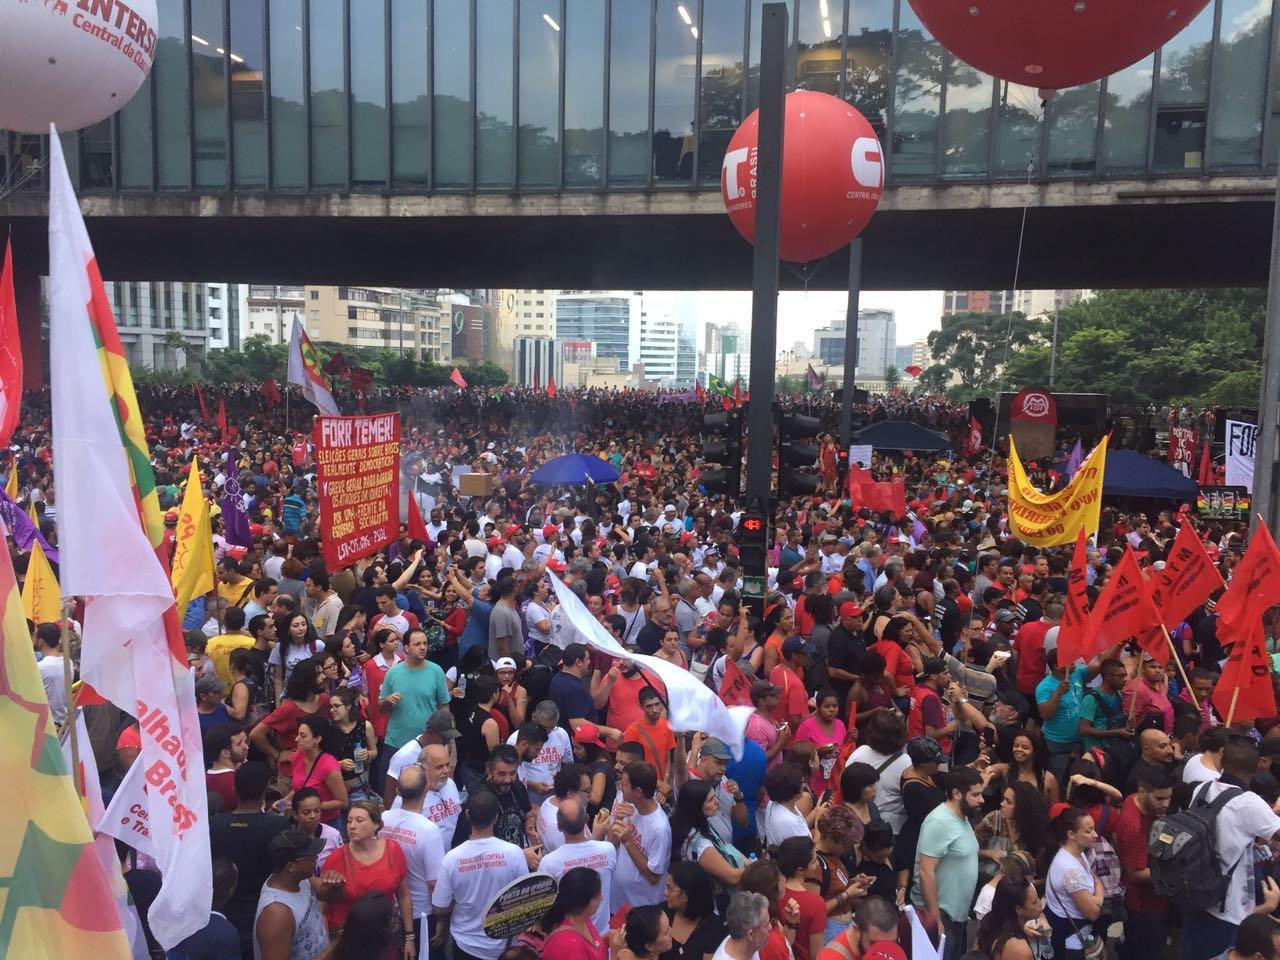 Manifestantes durante protesto na av. Paulista contra reforma da Previdência - 15/03/17